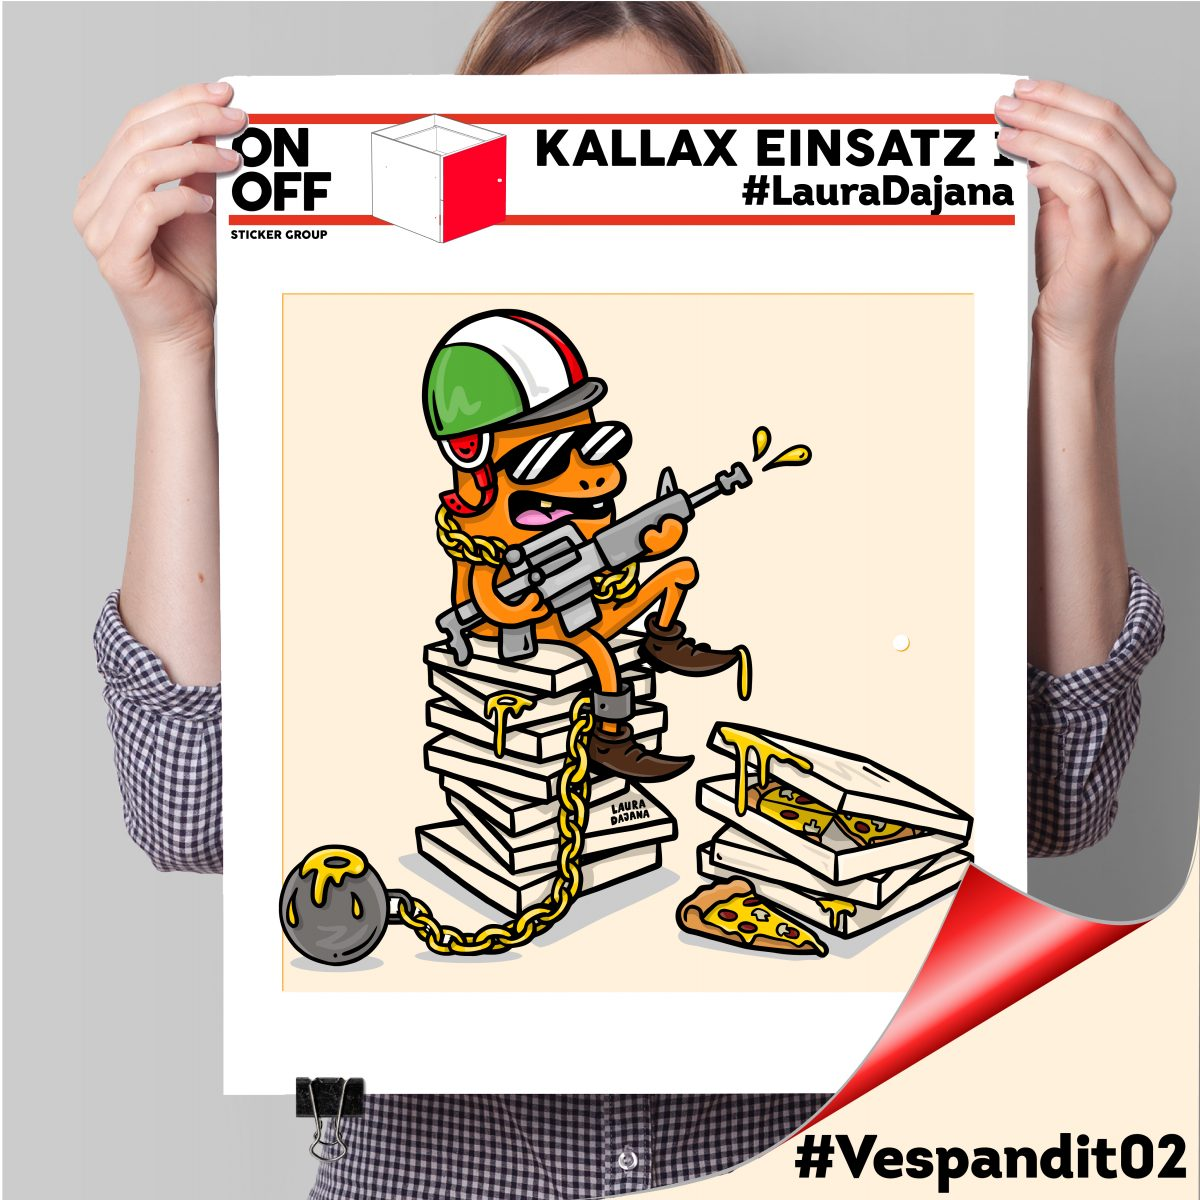 Kallax Einsatz 1 TÜR #LauraDajana#Vespandit02